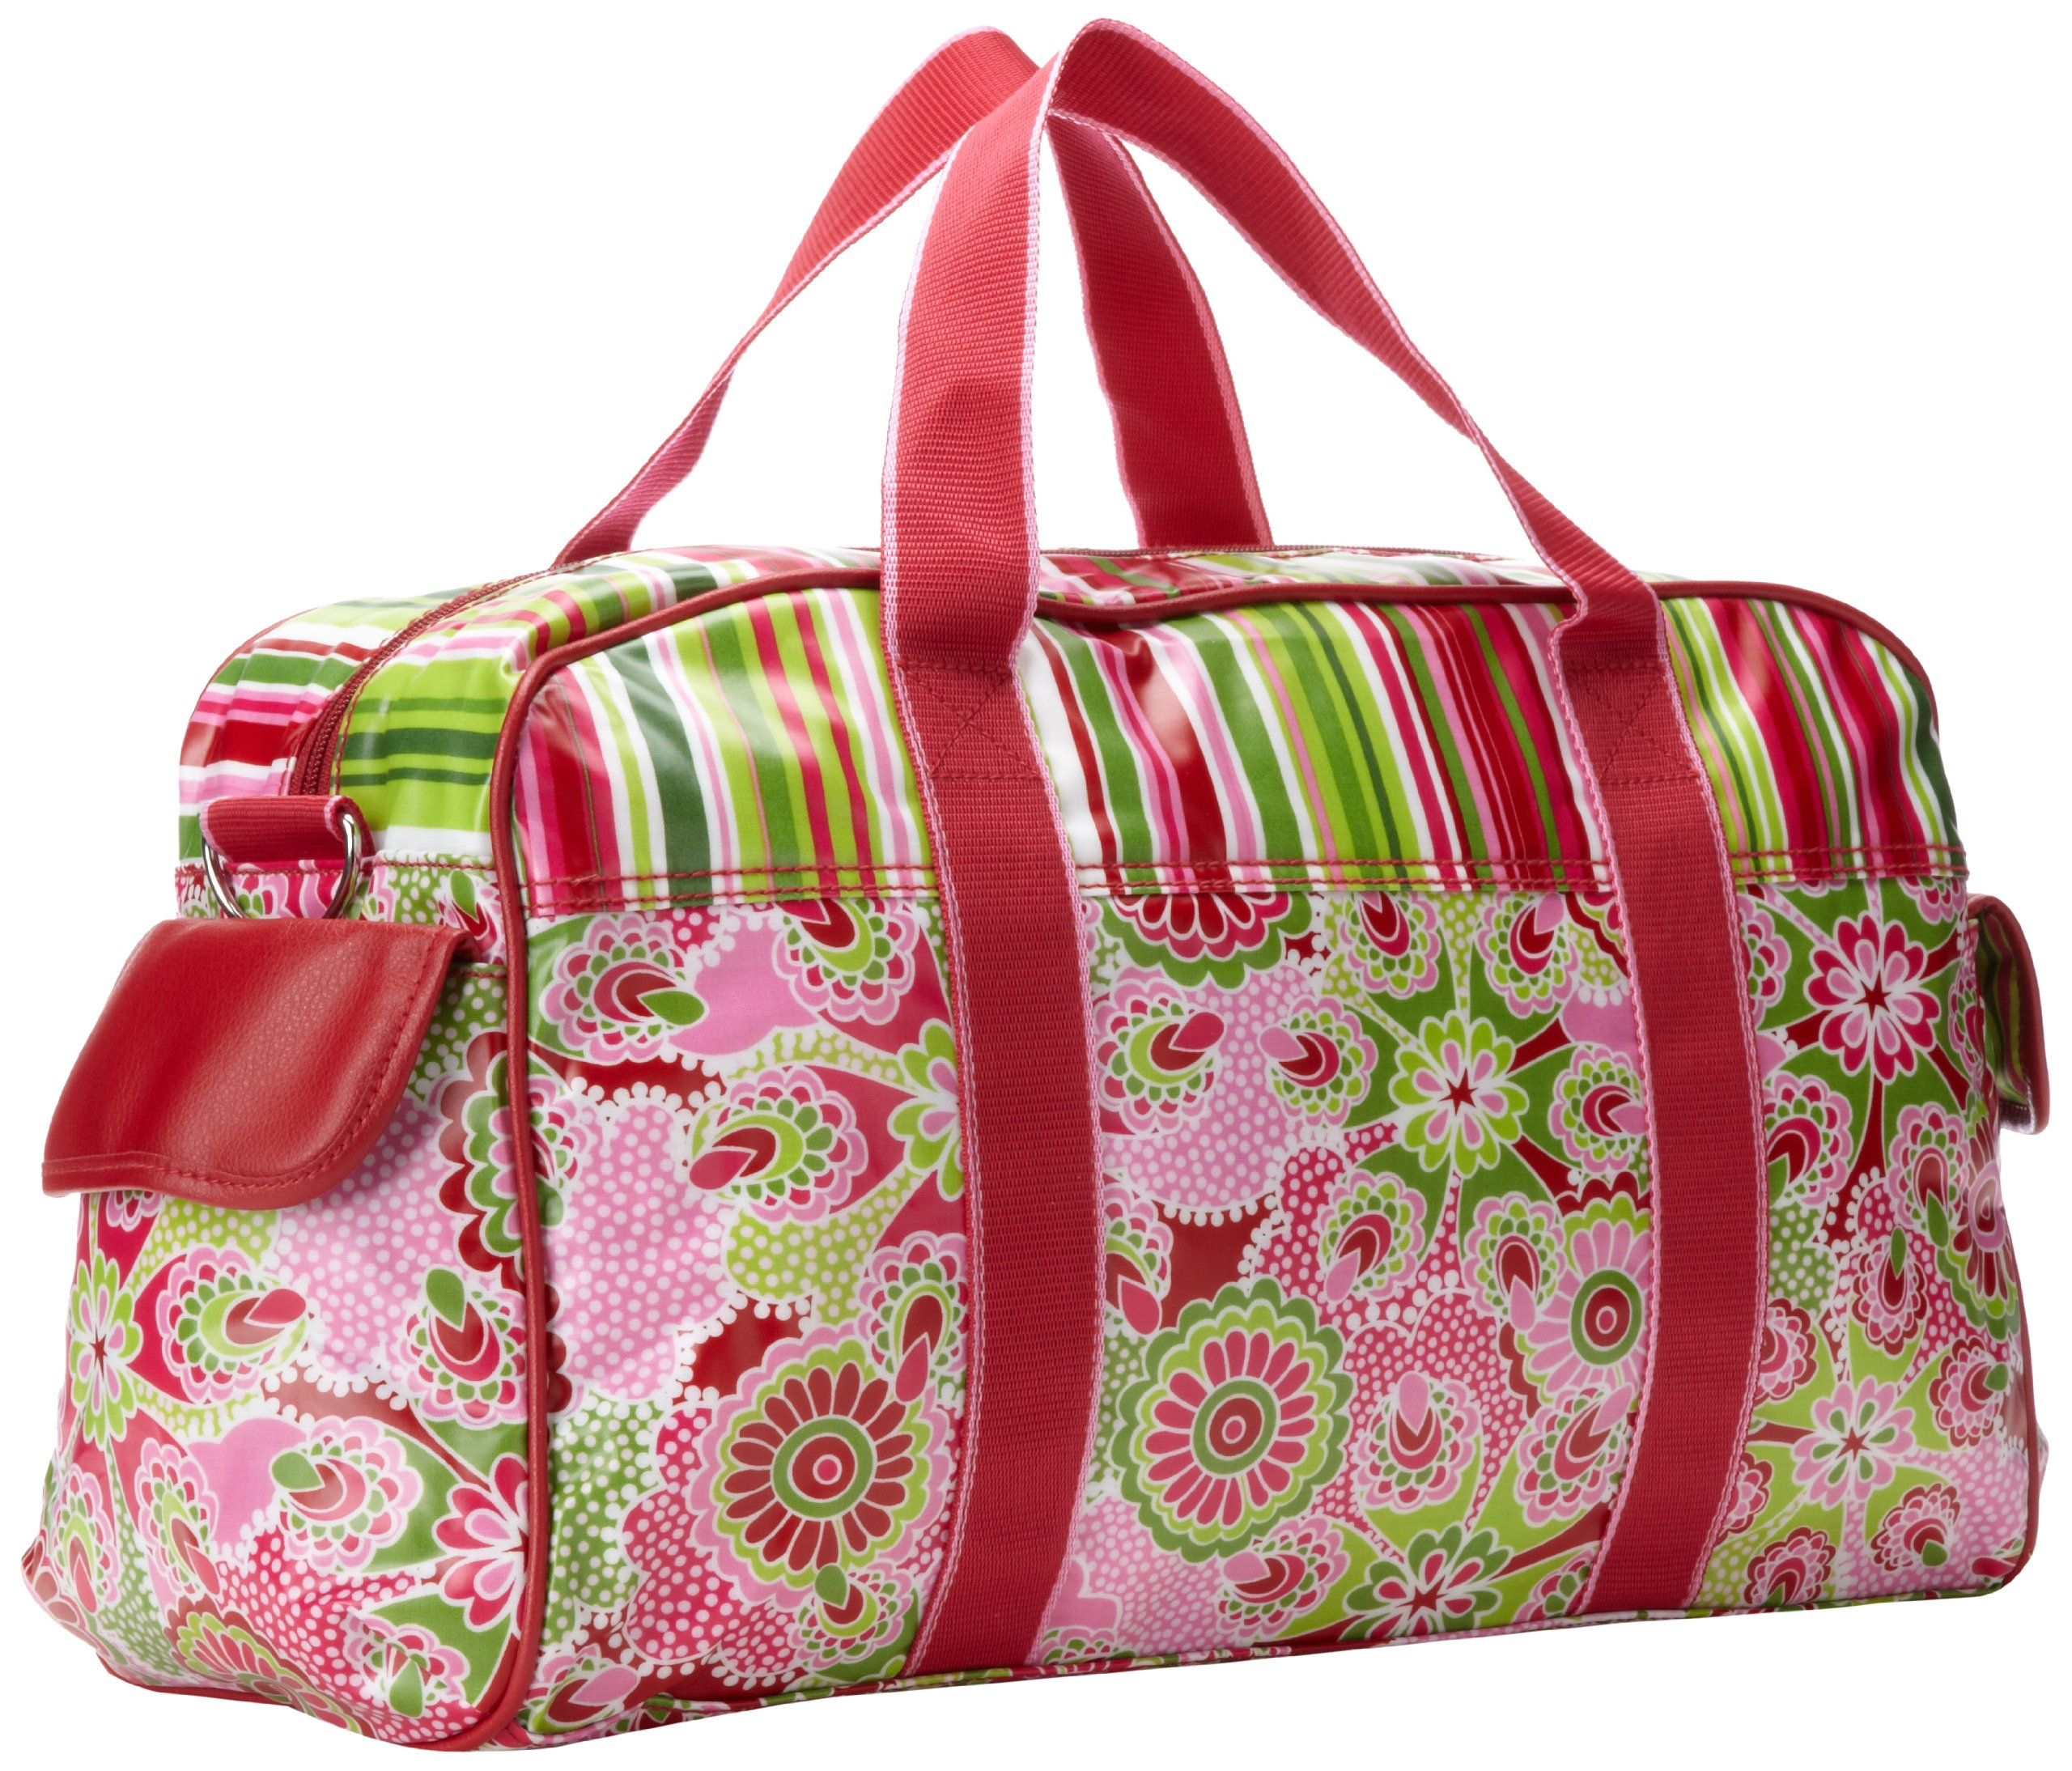 Hadaki Cool HDK826 Duffle Bag,Jazz Ruby,One Size by HADAKI (Image #3)